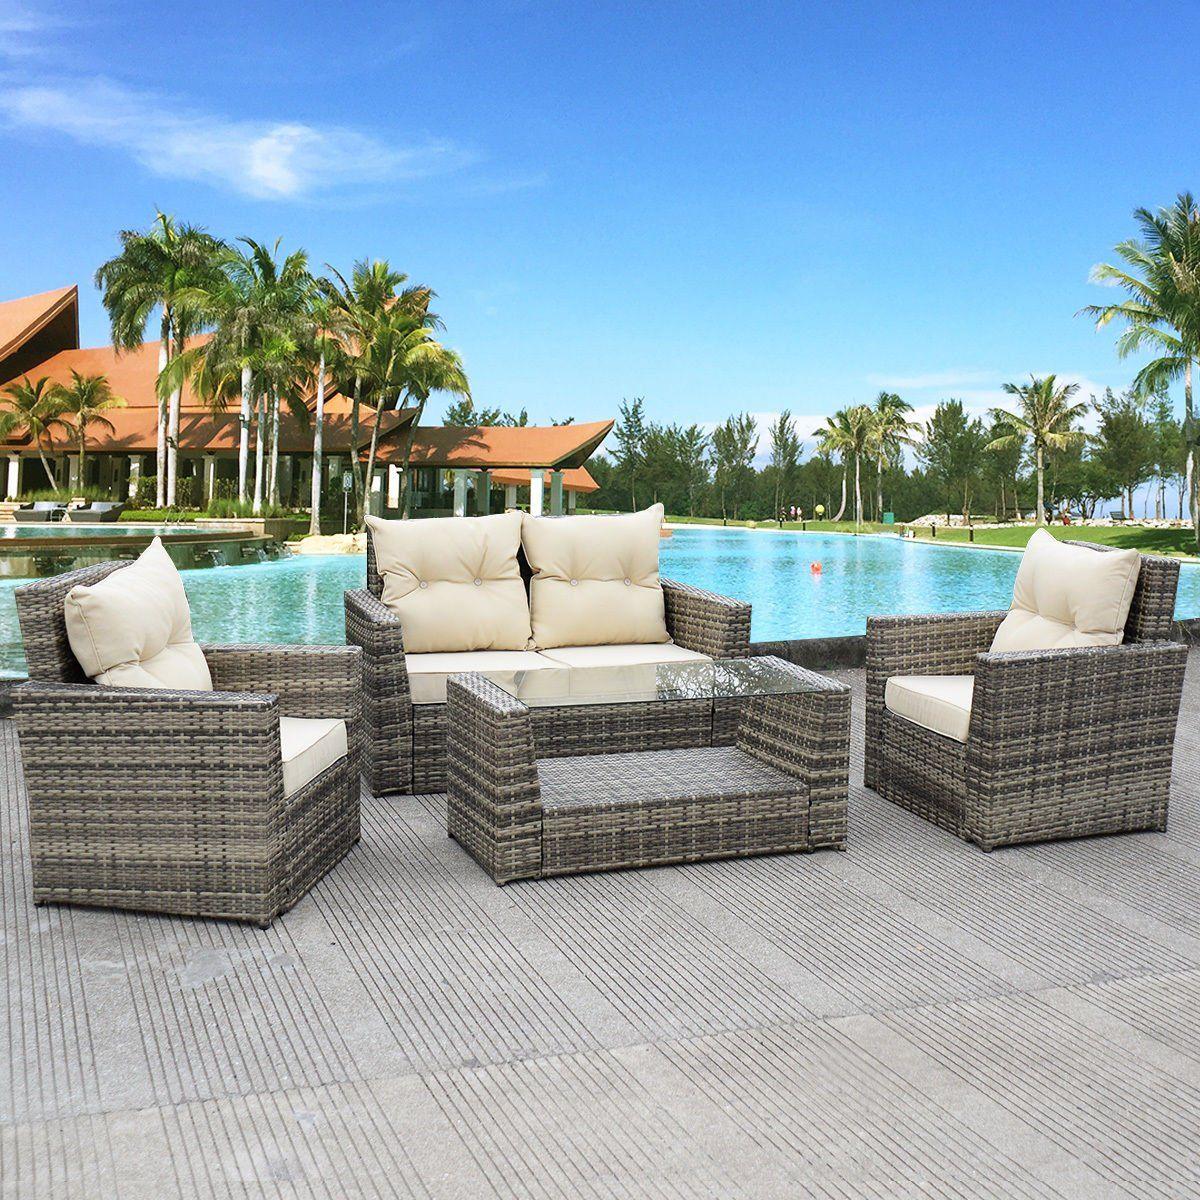 Tangkula 4PCS Outdoor Patio Rattan Wicker Furniture Set Loveseat